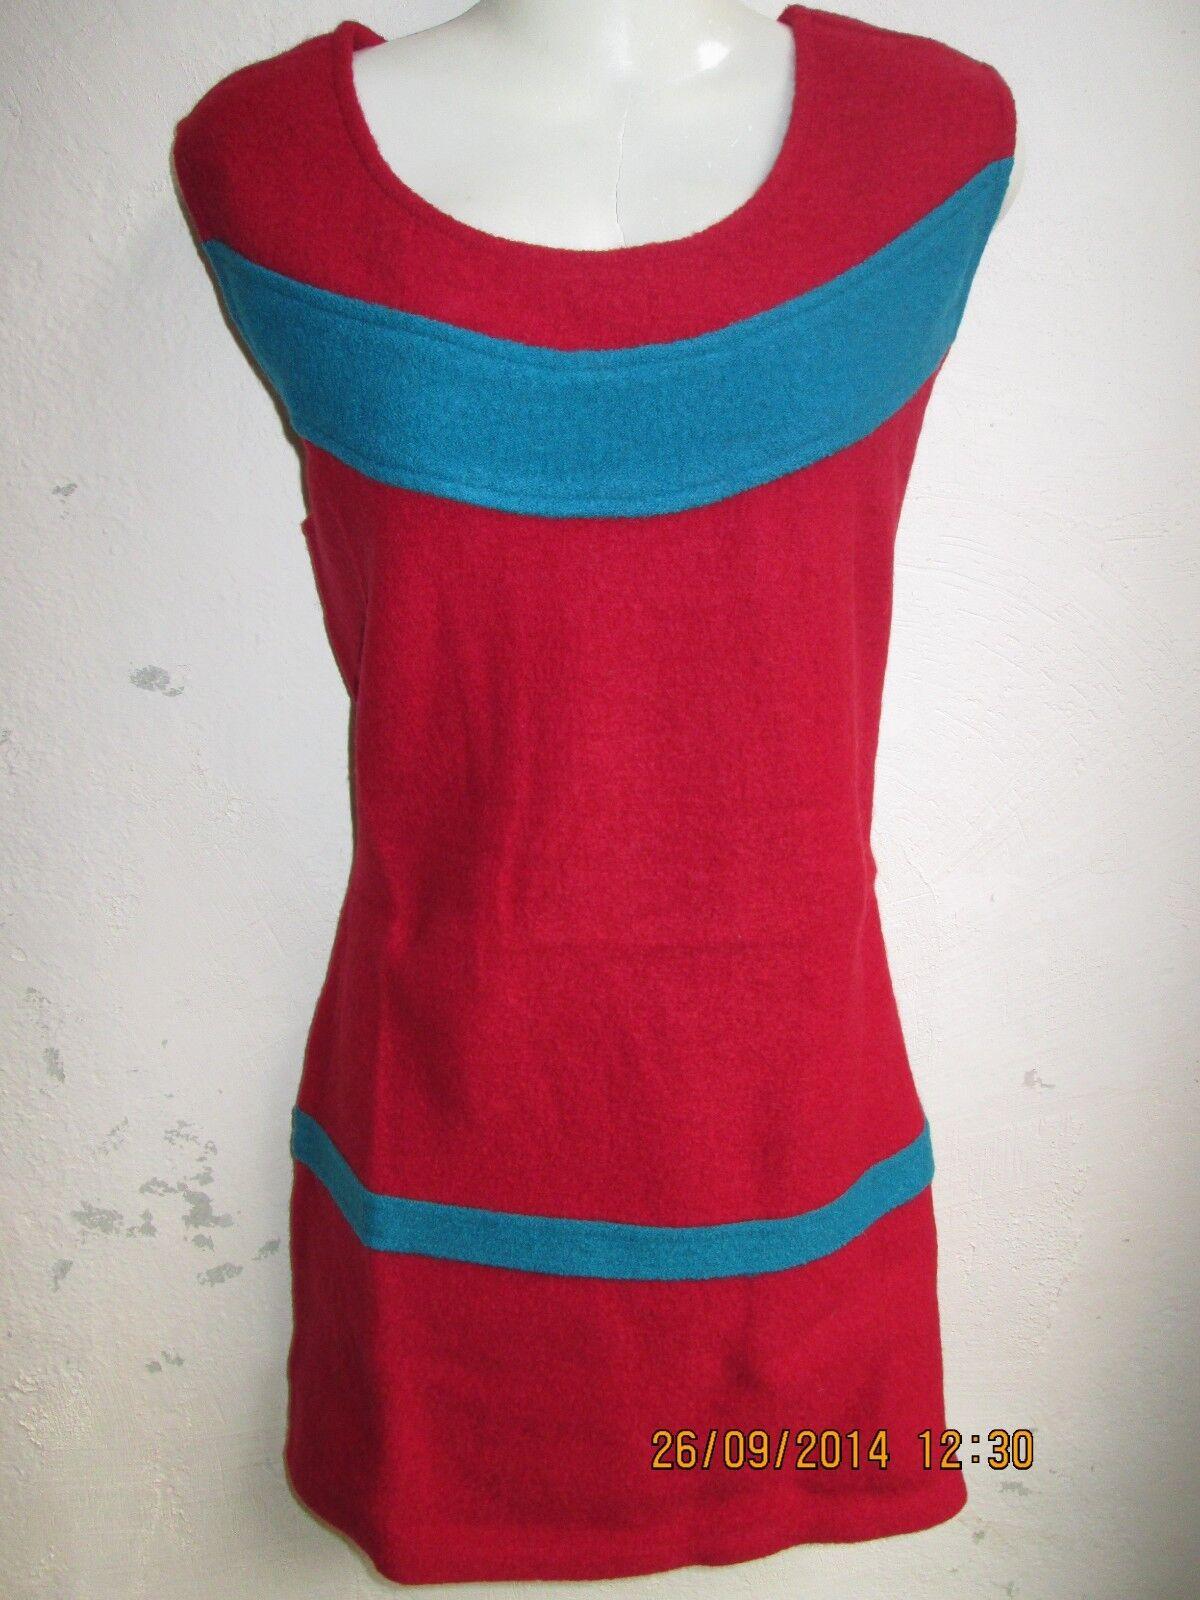 Chapati Kleid gefilzt joma Tunika Wolle Filzwolle Schurwolle Wollkleid L XL rot